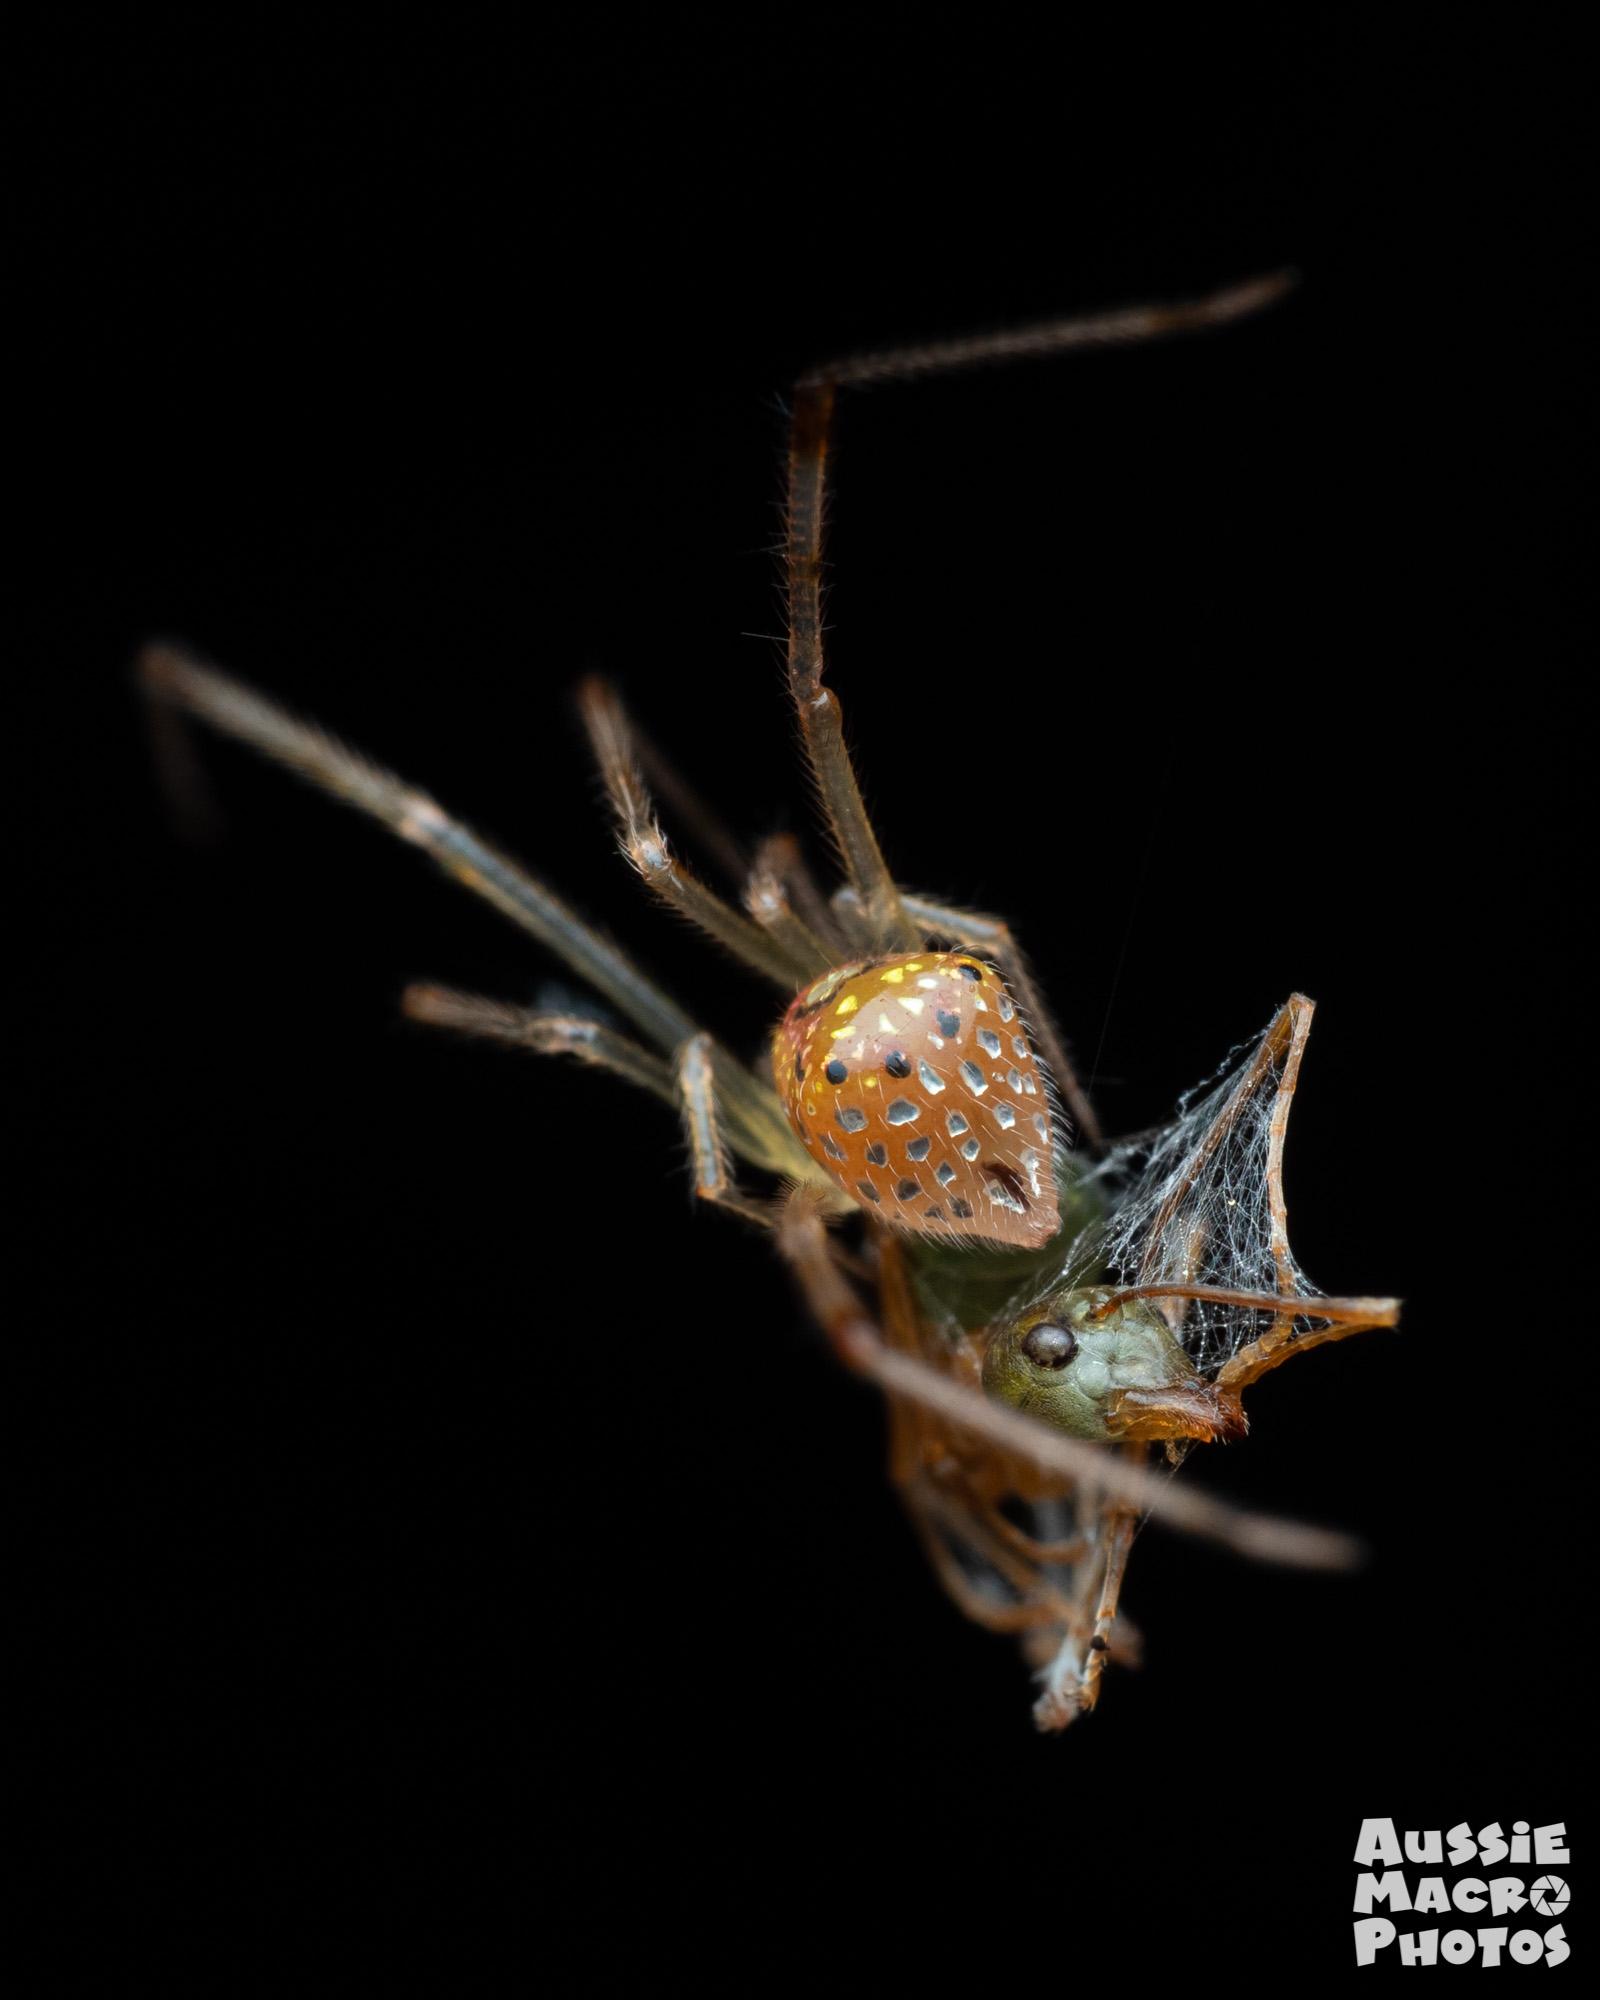 Mirrorball Spider (Thwaitesia sp.)